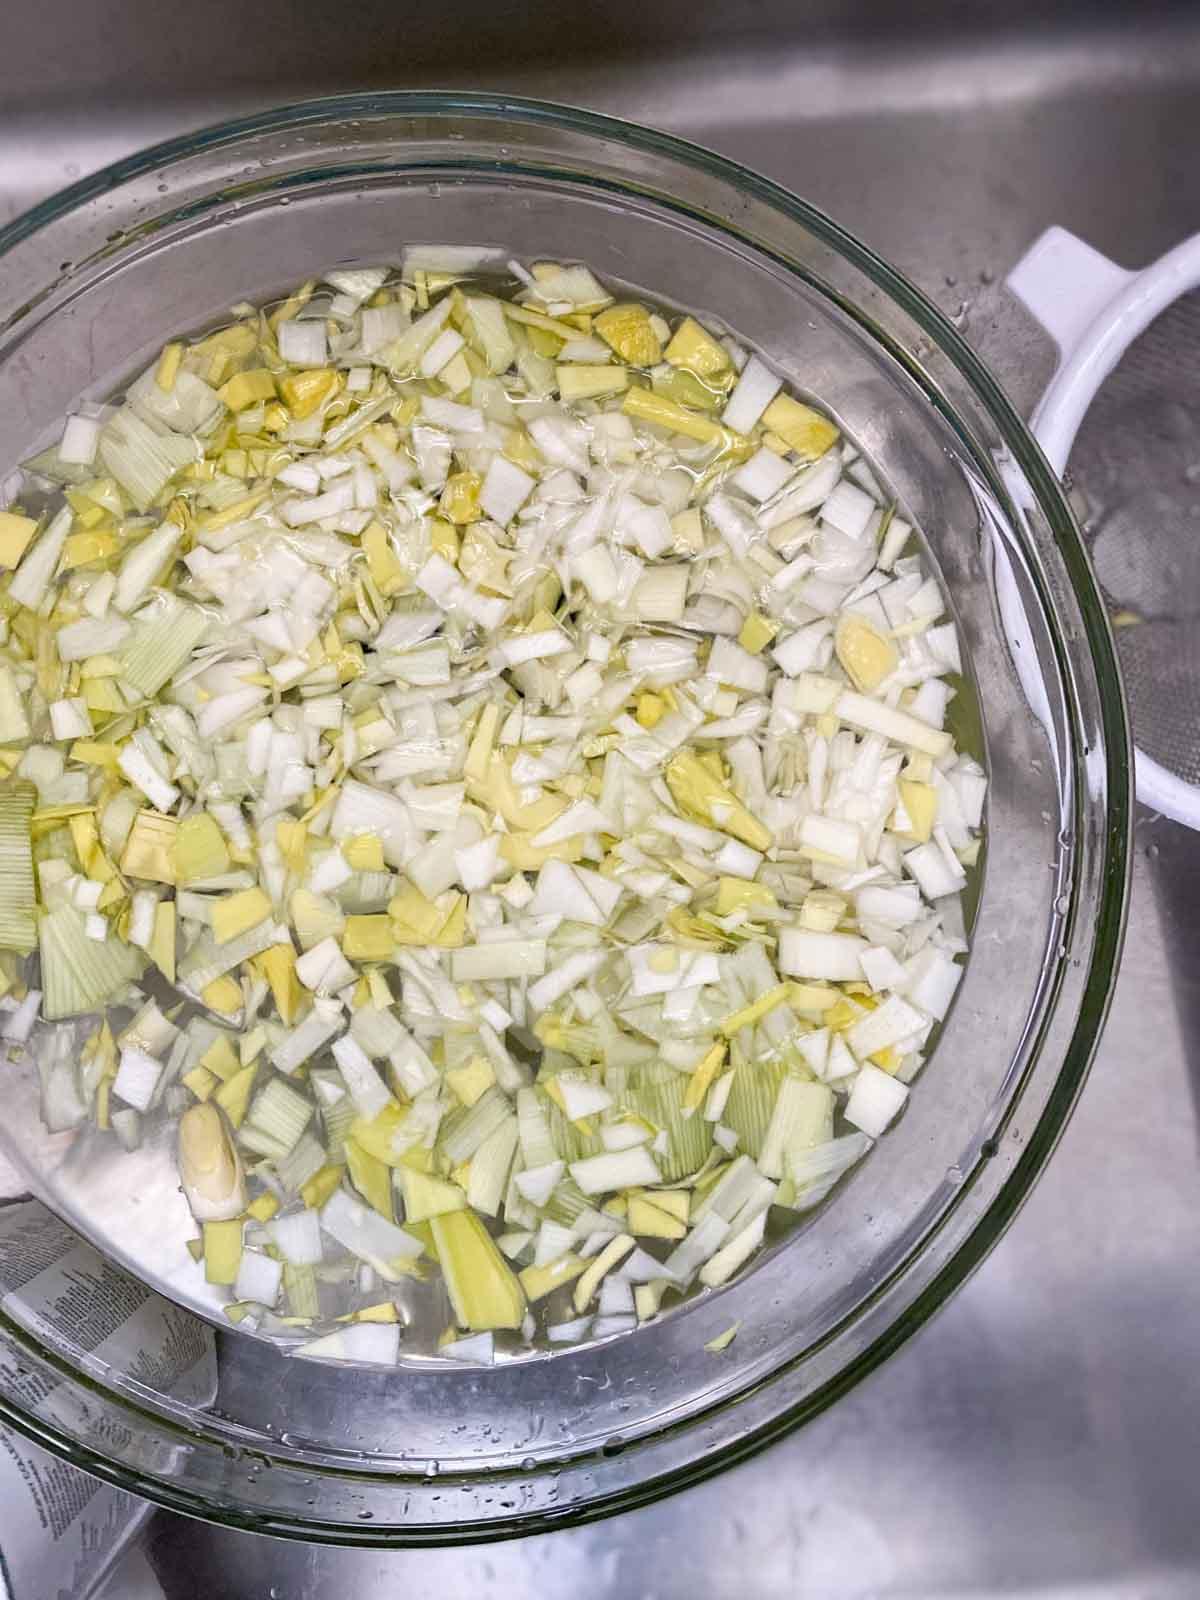 Leeks being washed in a colander